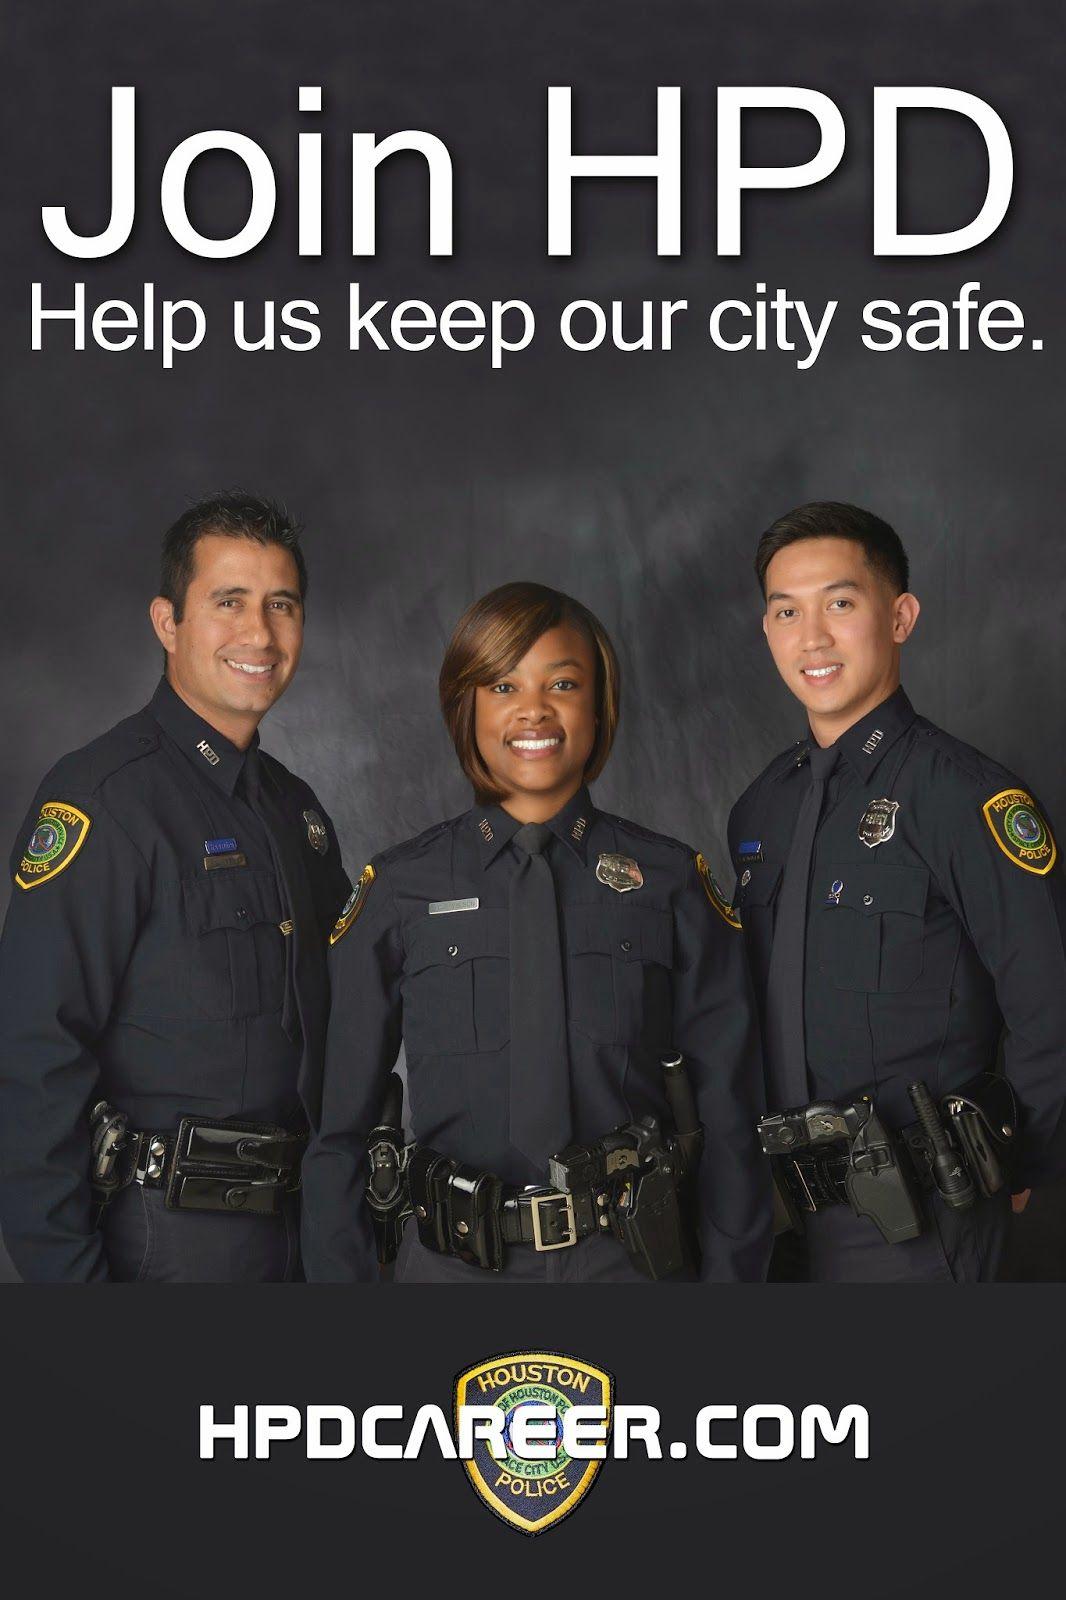 Houston police department join hpd houston police